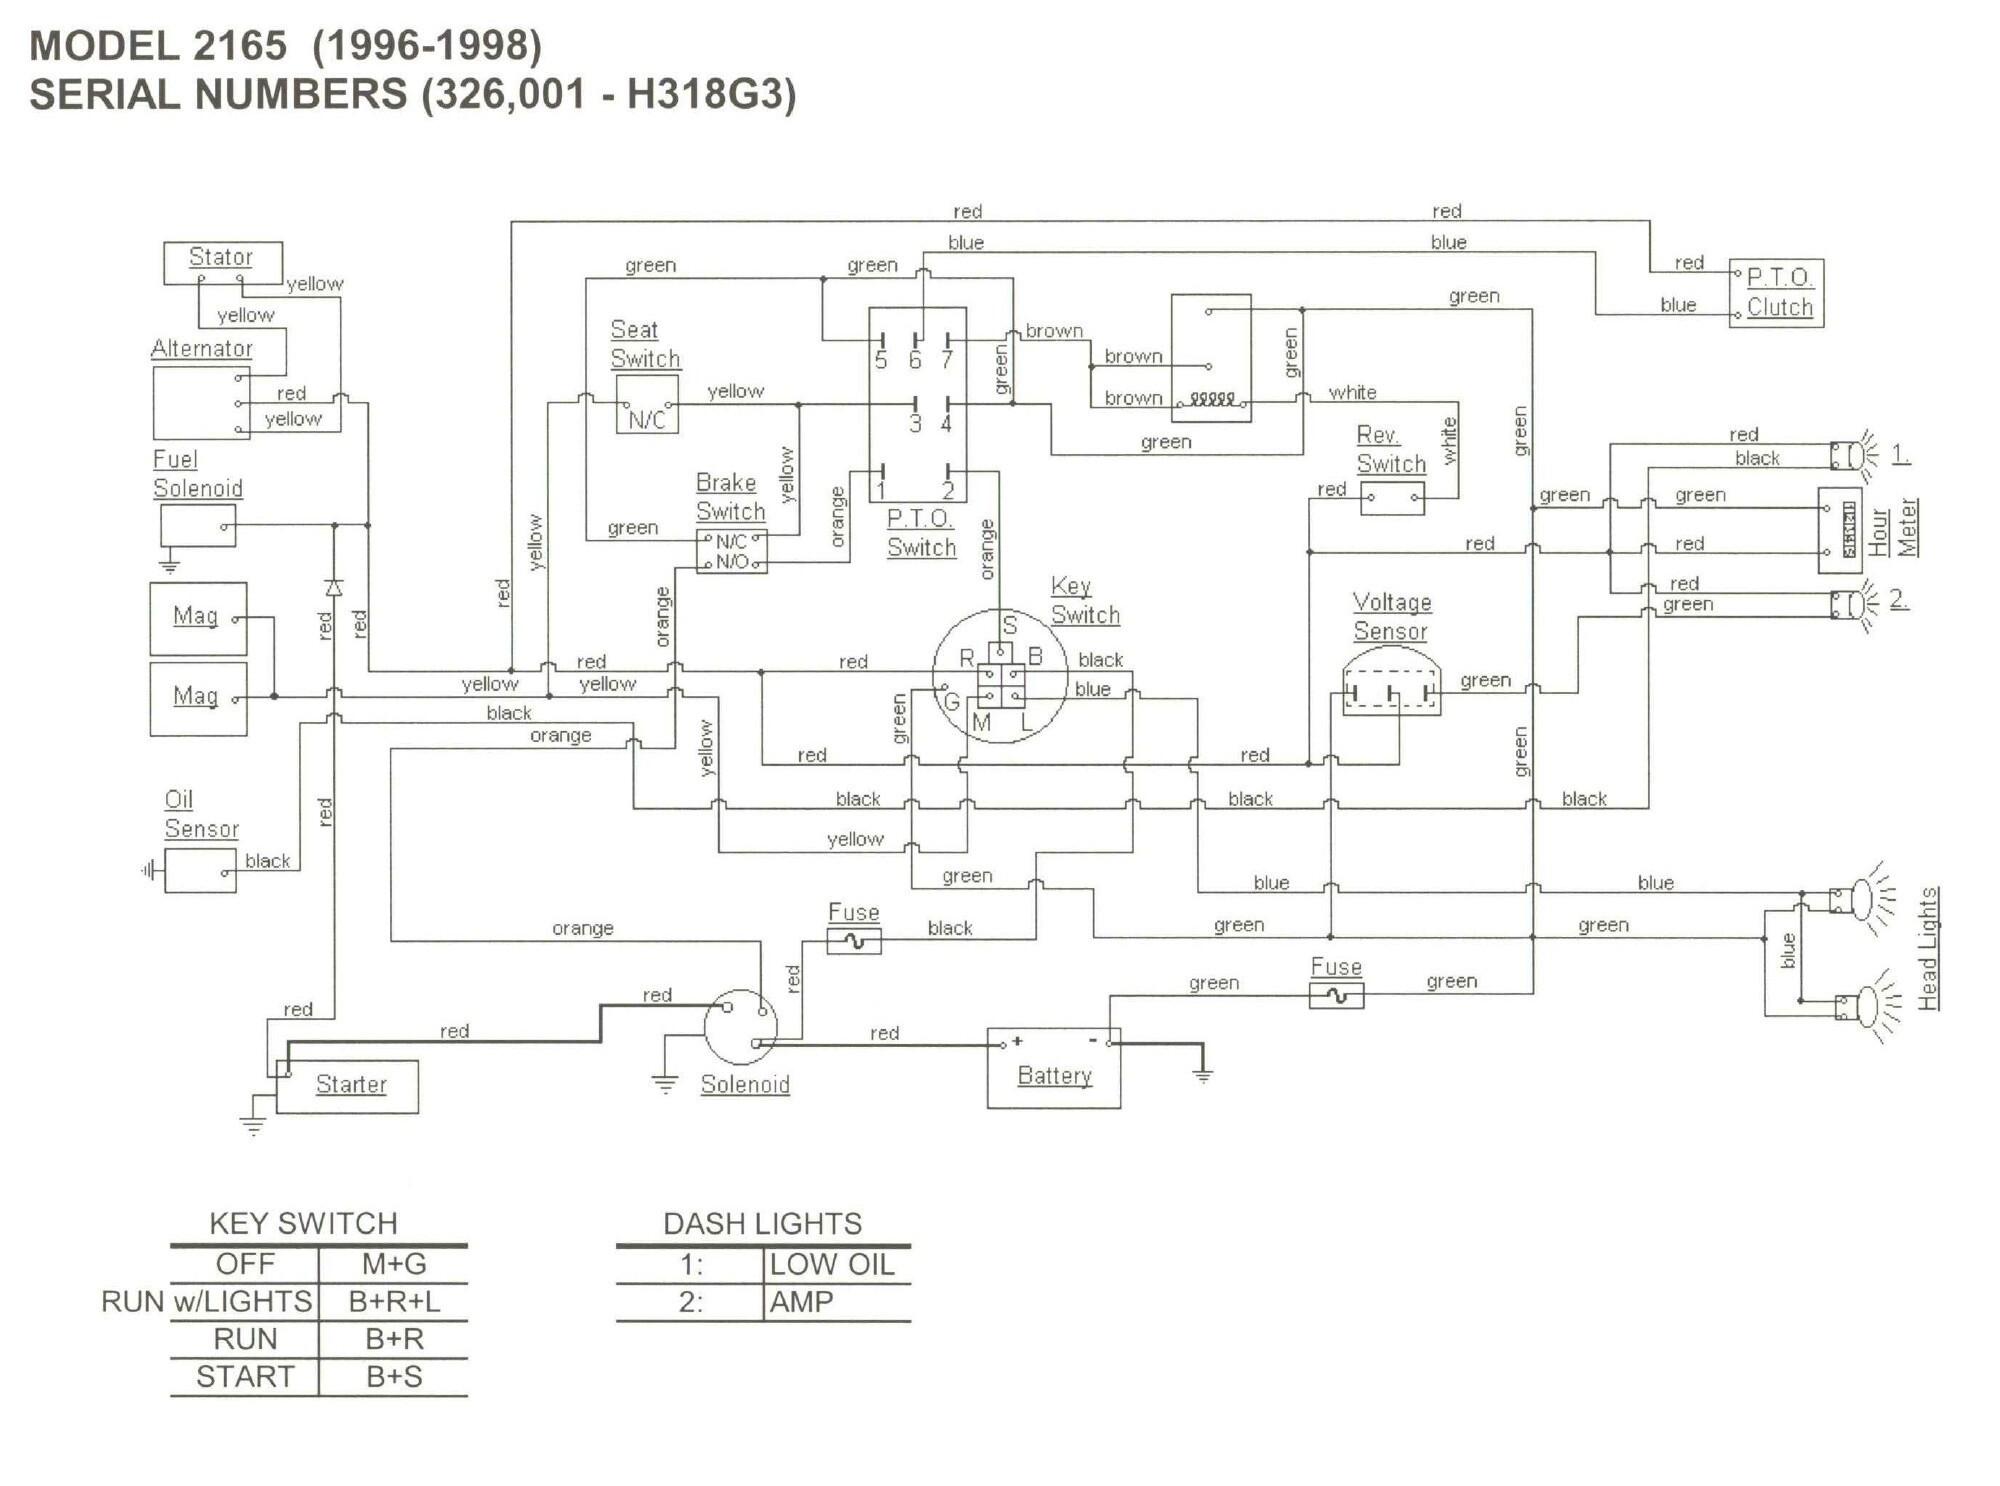 Kohler Cub Cadet Wiring Diagram from static-cdn.imageservice.cloud